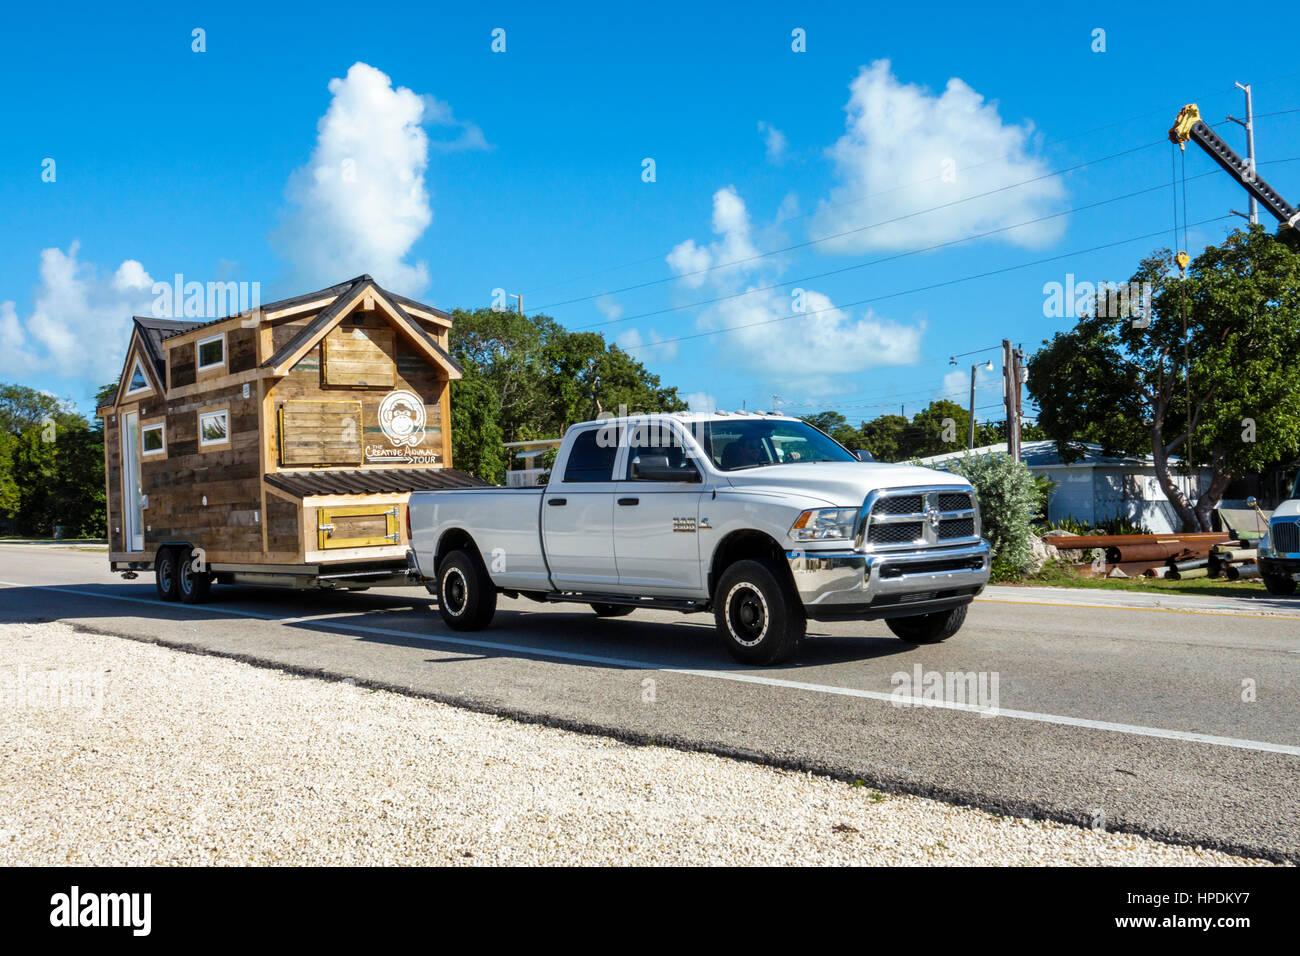 Key Largo Florida Upper Florida Keys little house moving transporting hauling trailer Route 1 Overseas Highway Stock Photo